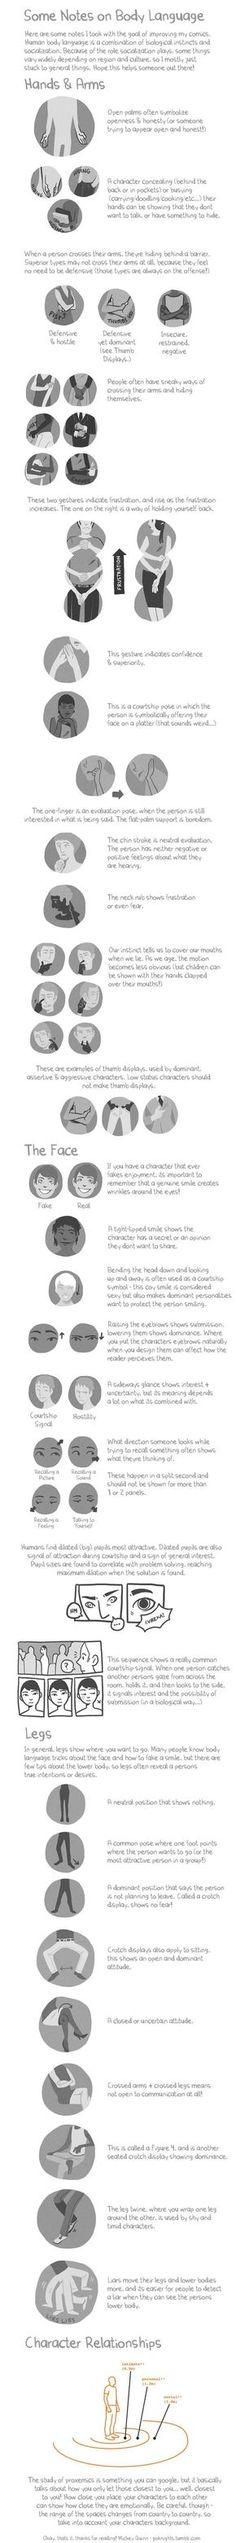 Body Language Reference Sheet - Writers Write